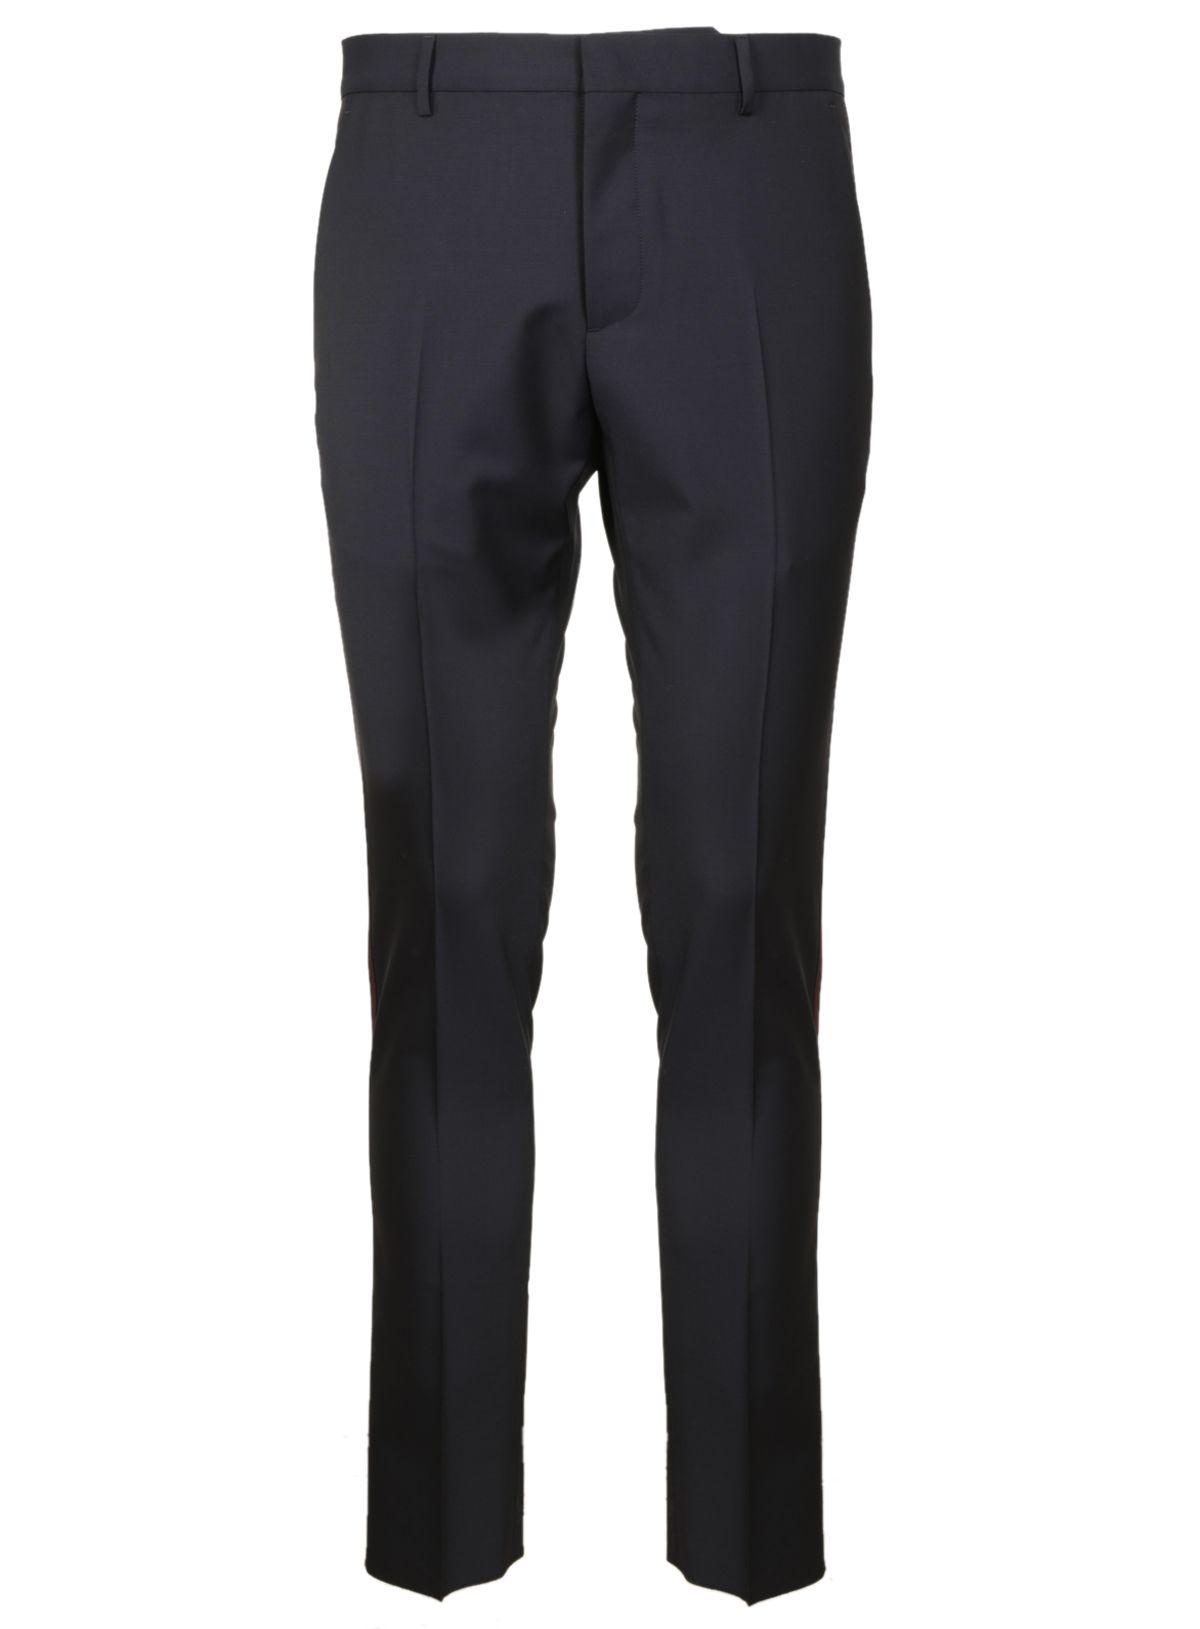 Valentino Valentino Tailored Trousers